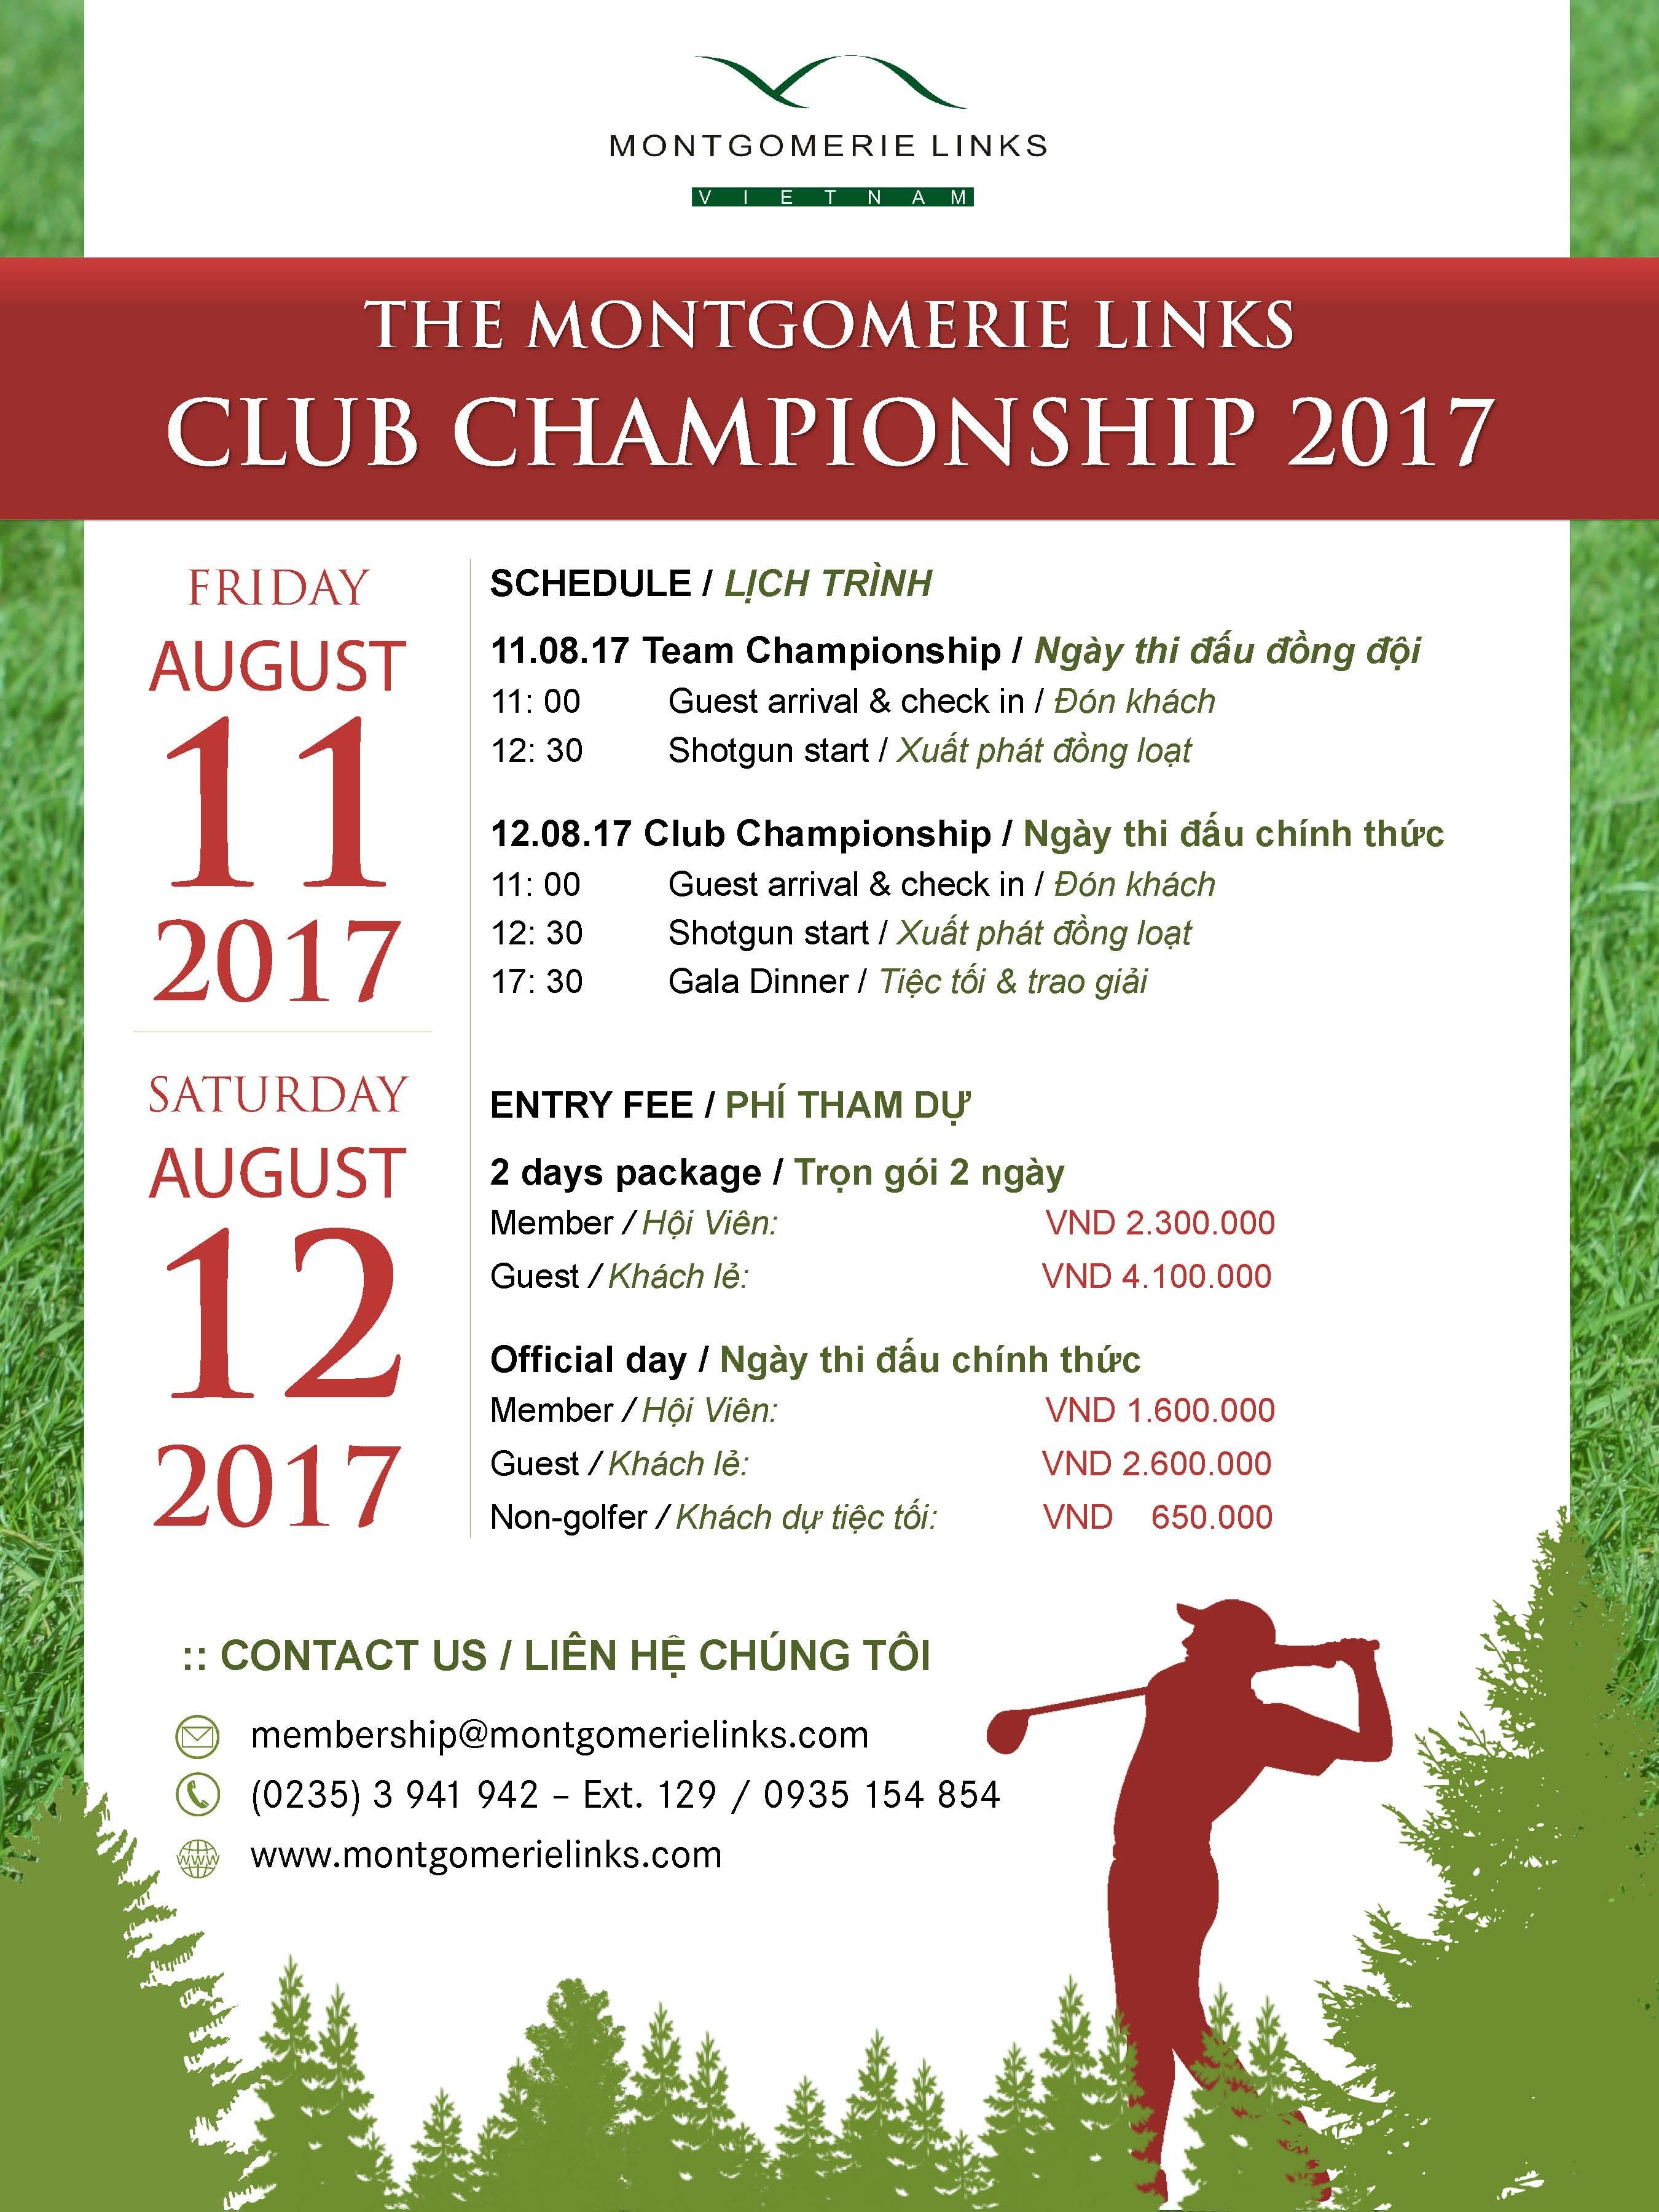 Giải Montgomerie Links Vietnam Club Championship 2017